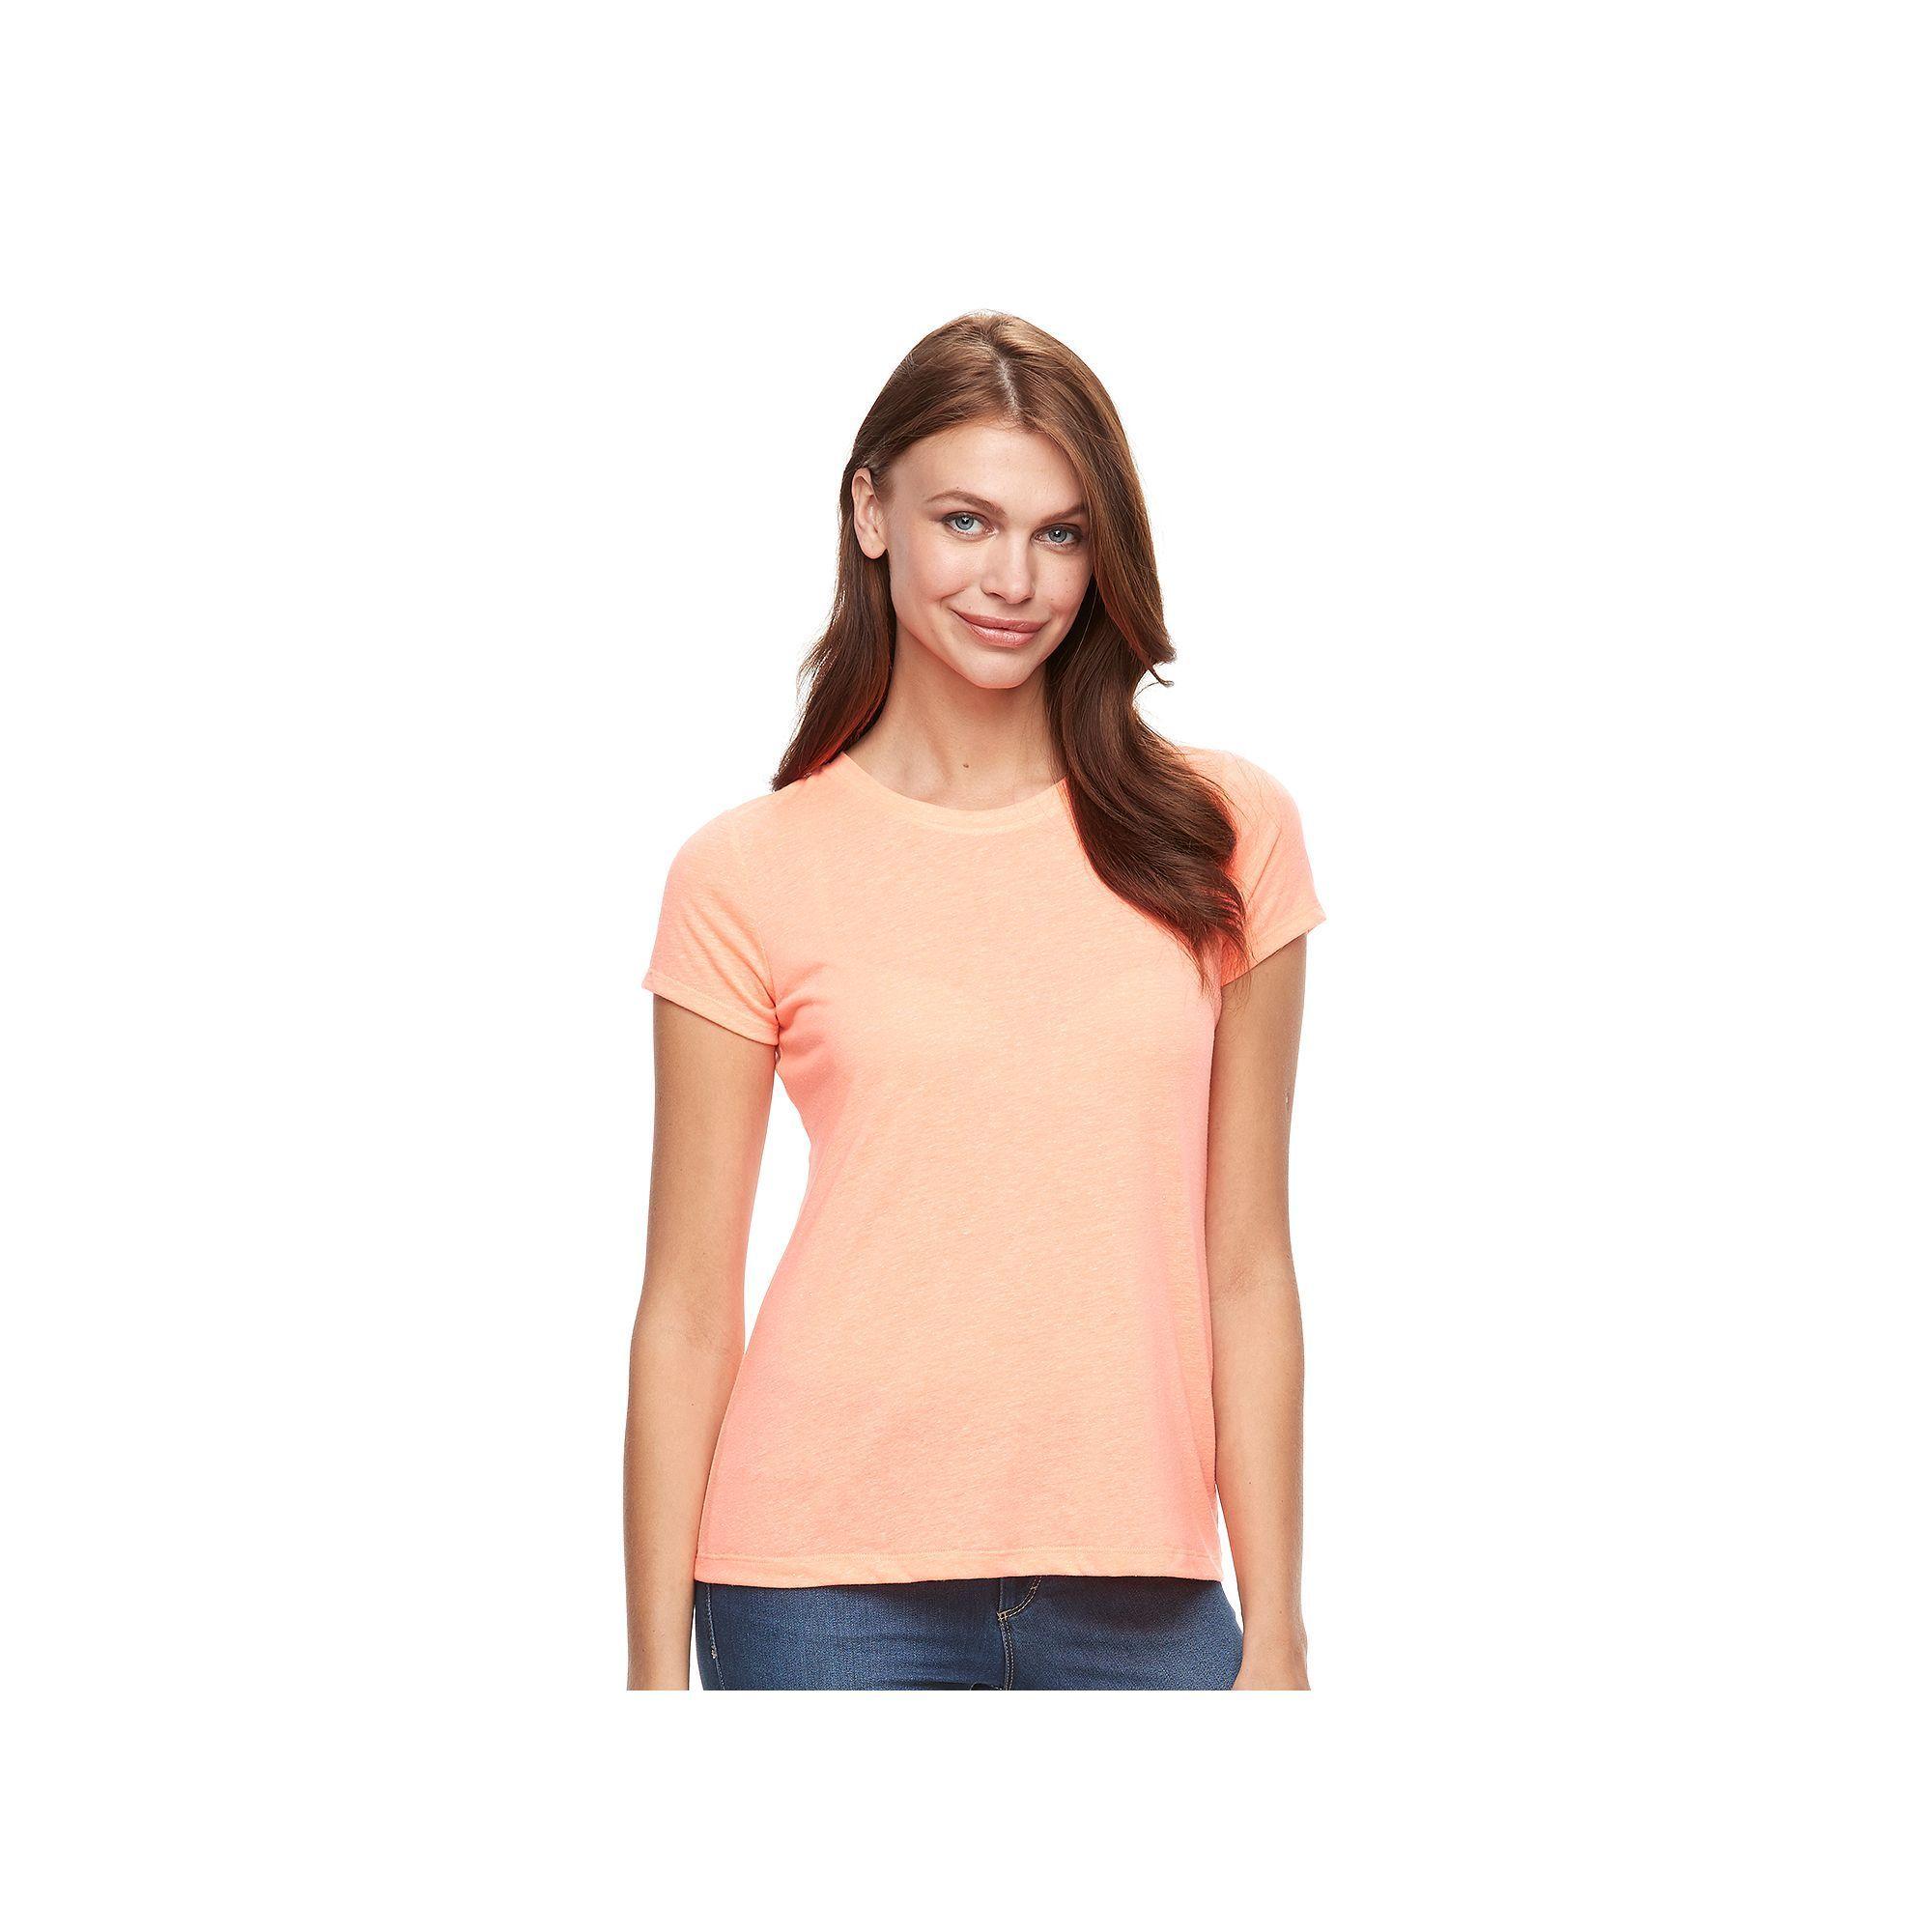 Women's Apt. 9® Essential Marled Crewneck Tee, Size: Medium, Brt Orange